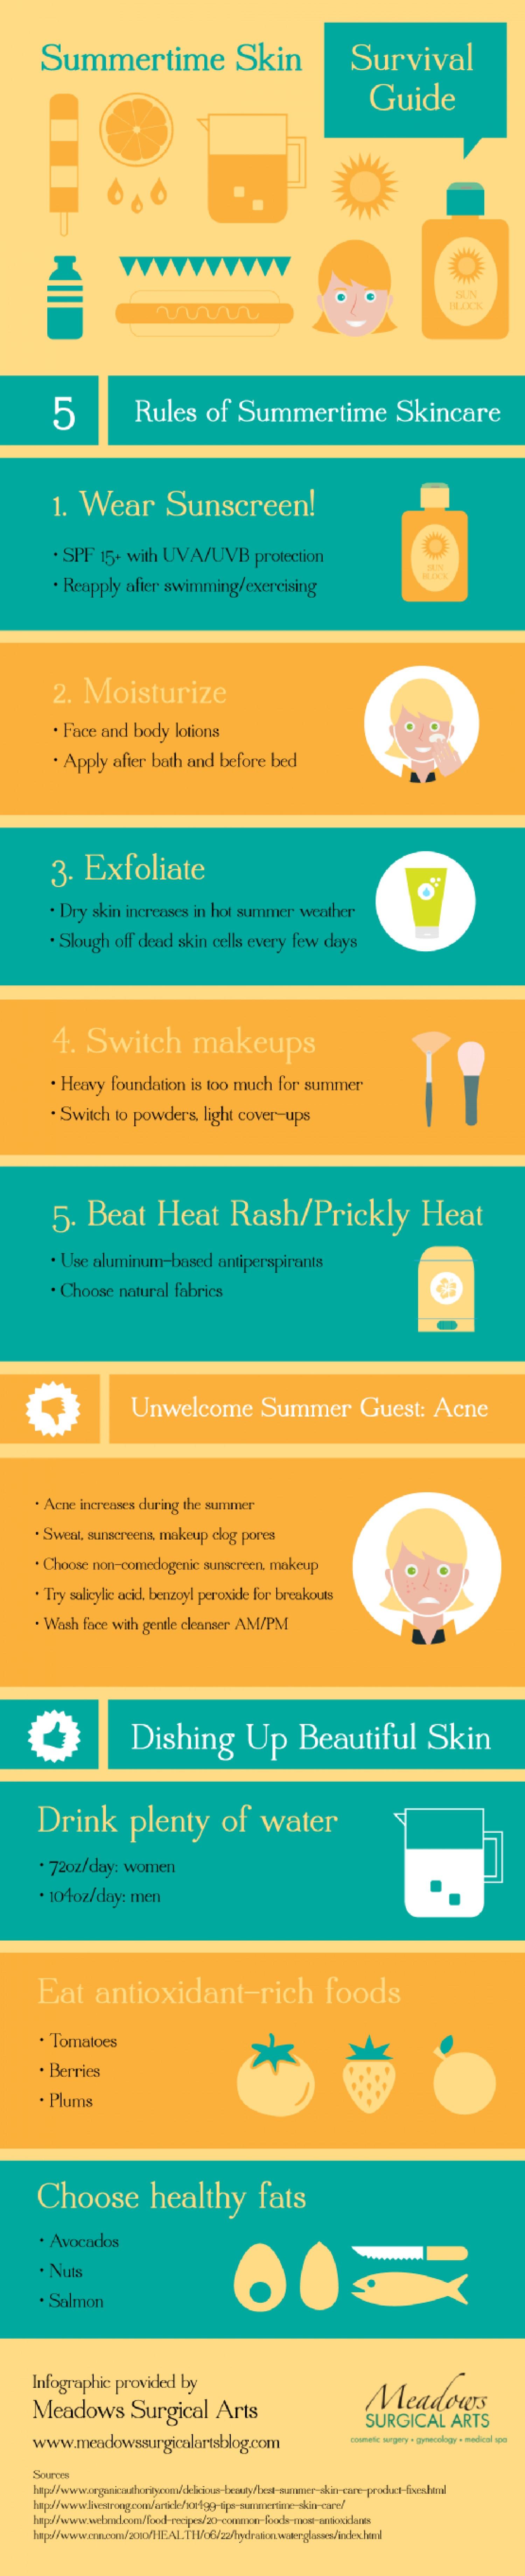 Summertime Skin Survival Guide Infographic